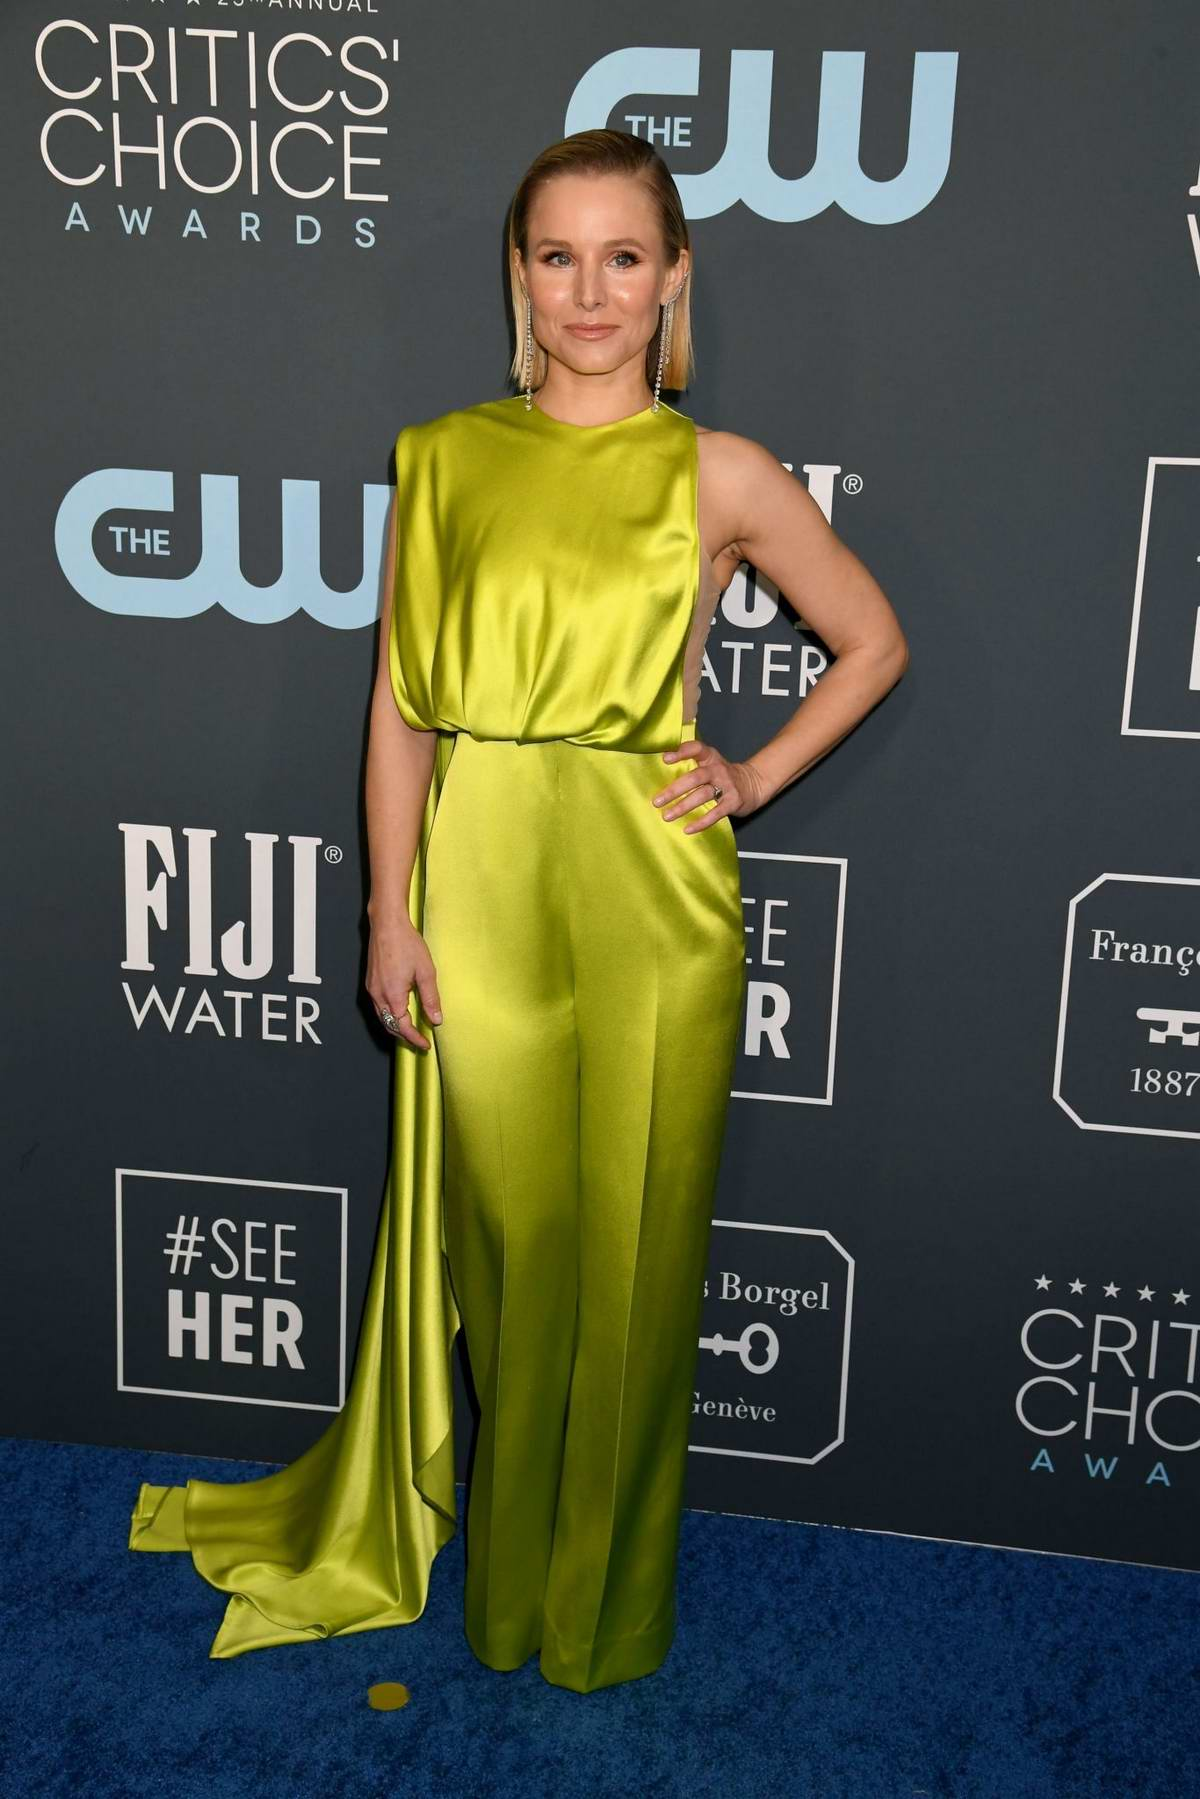 Kristen Bell attends the 25th Annual Critics' Choice Awards at Barker Hangar in Santa Monica, California